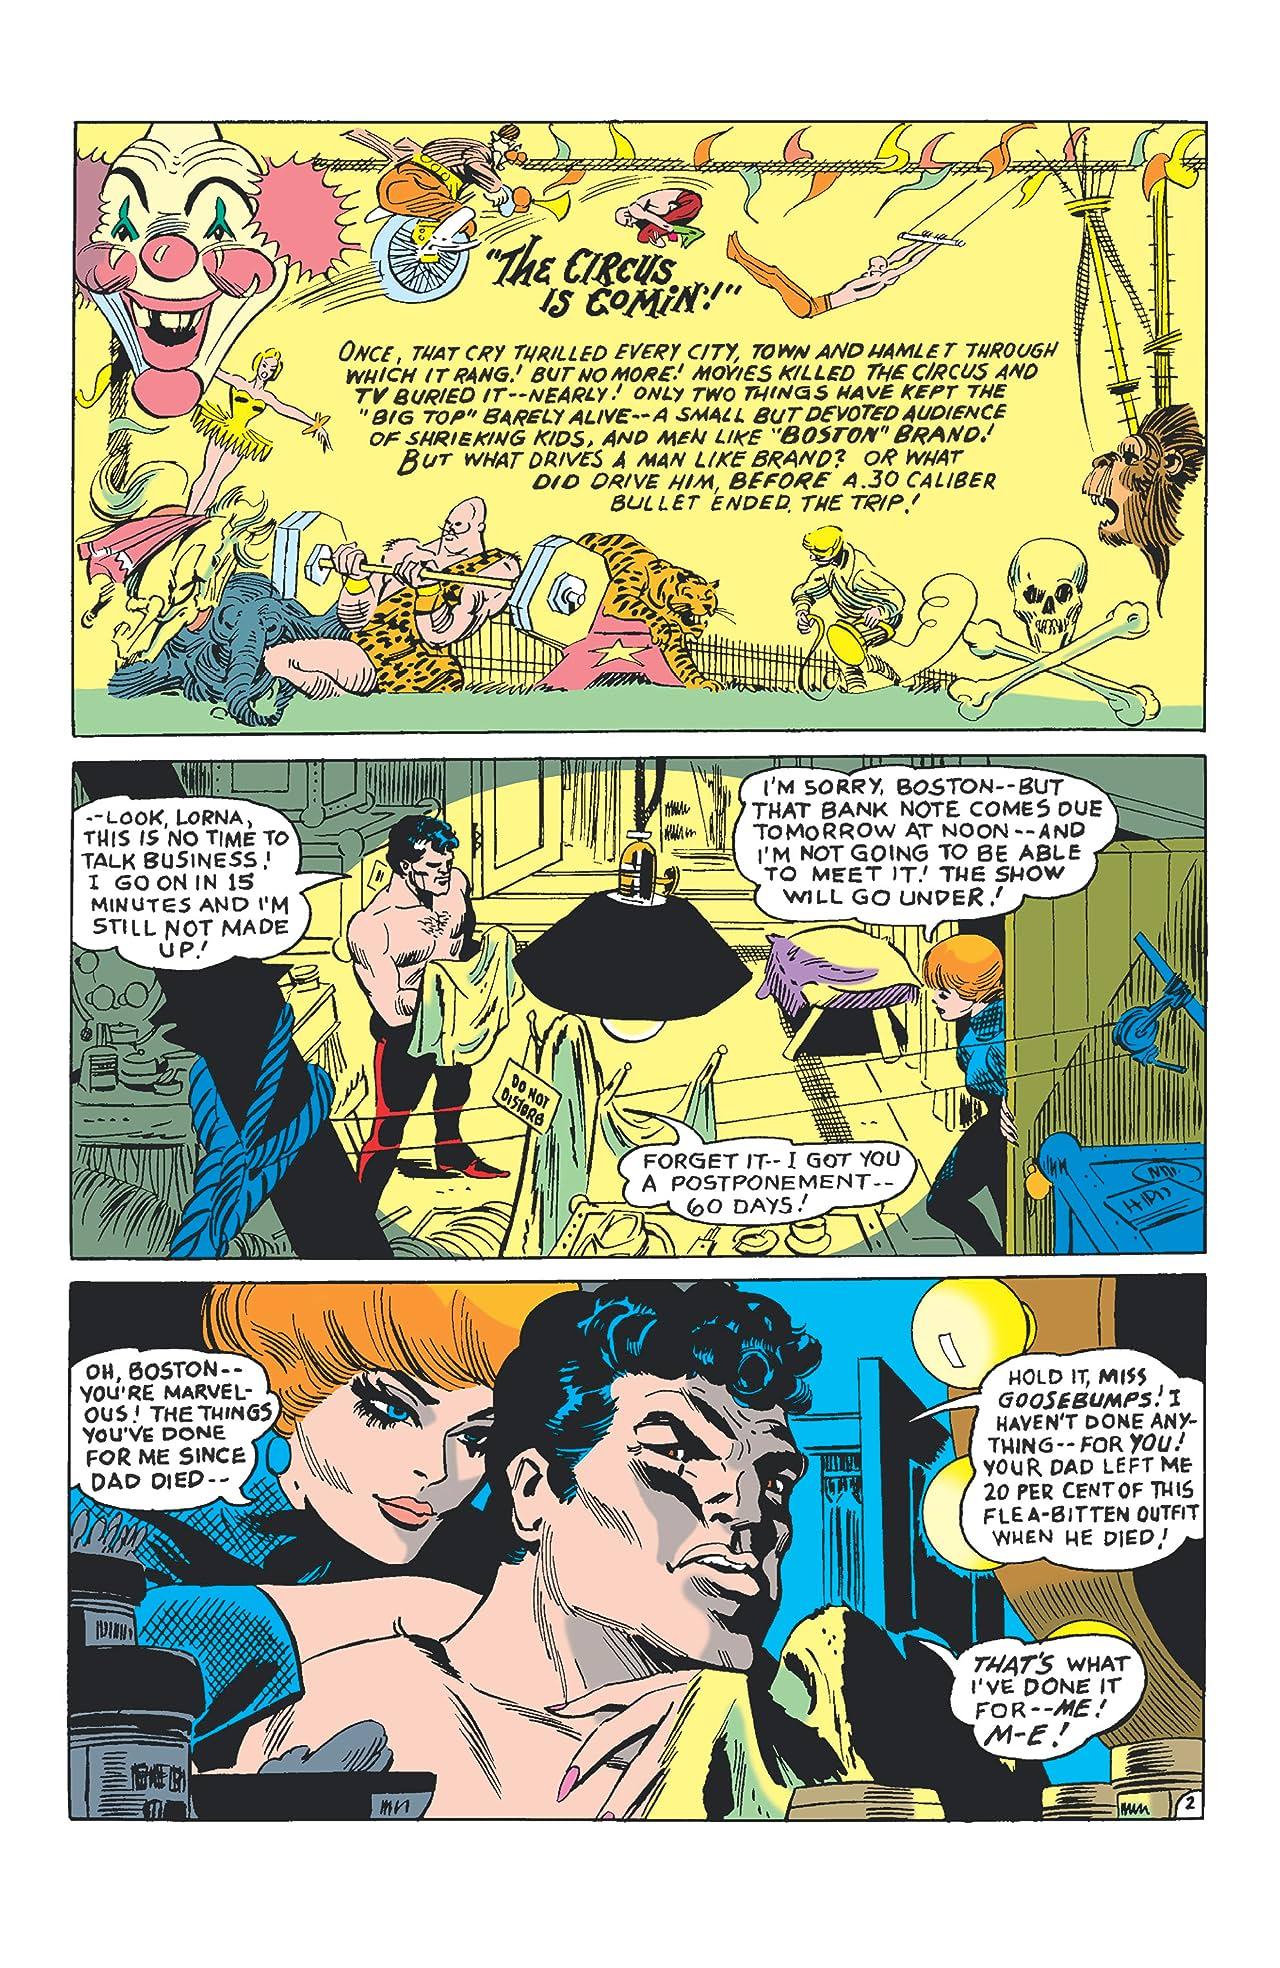 Deadman (1985) #1